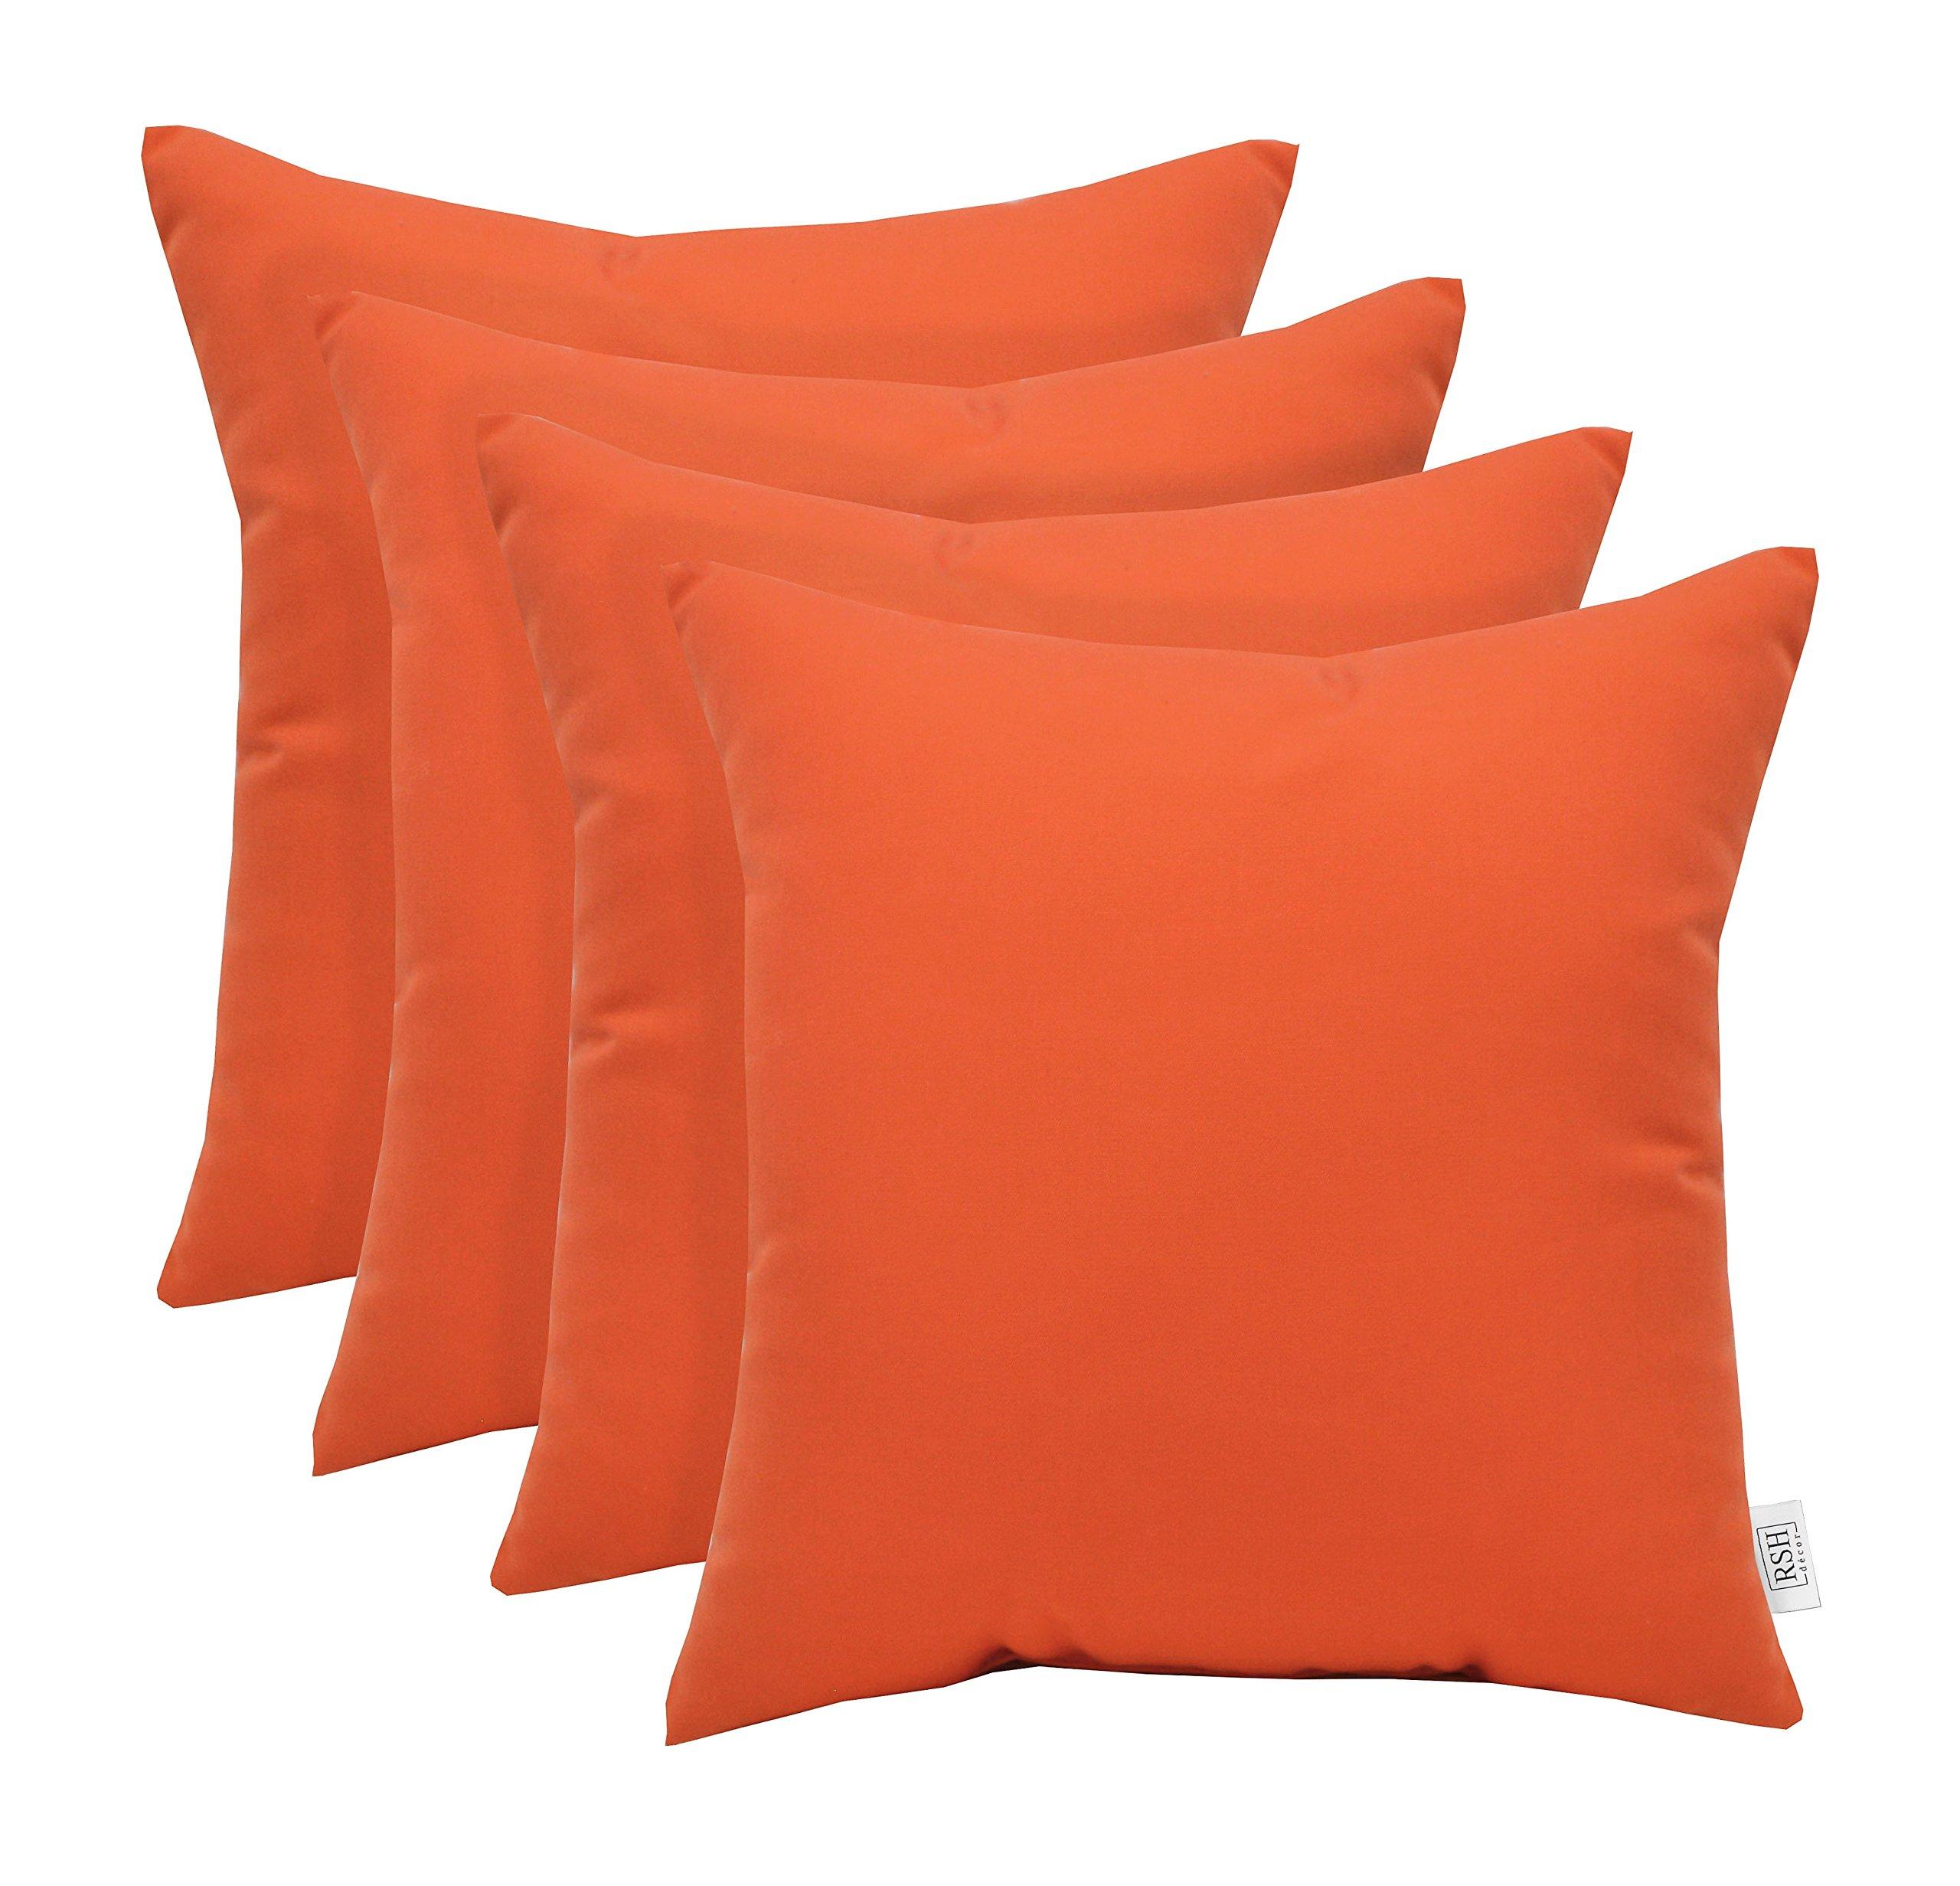 RSH Décor Set of 4 Indoor Outdoor Decorative Throw Pillows Sunbrella Canvas Melon ~ Vibrant Orange - Choose Size (20'' x 20'')